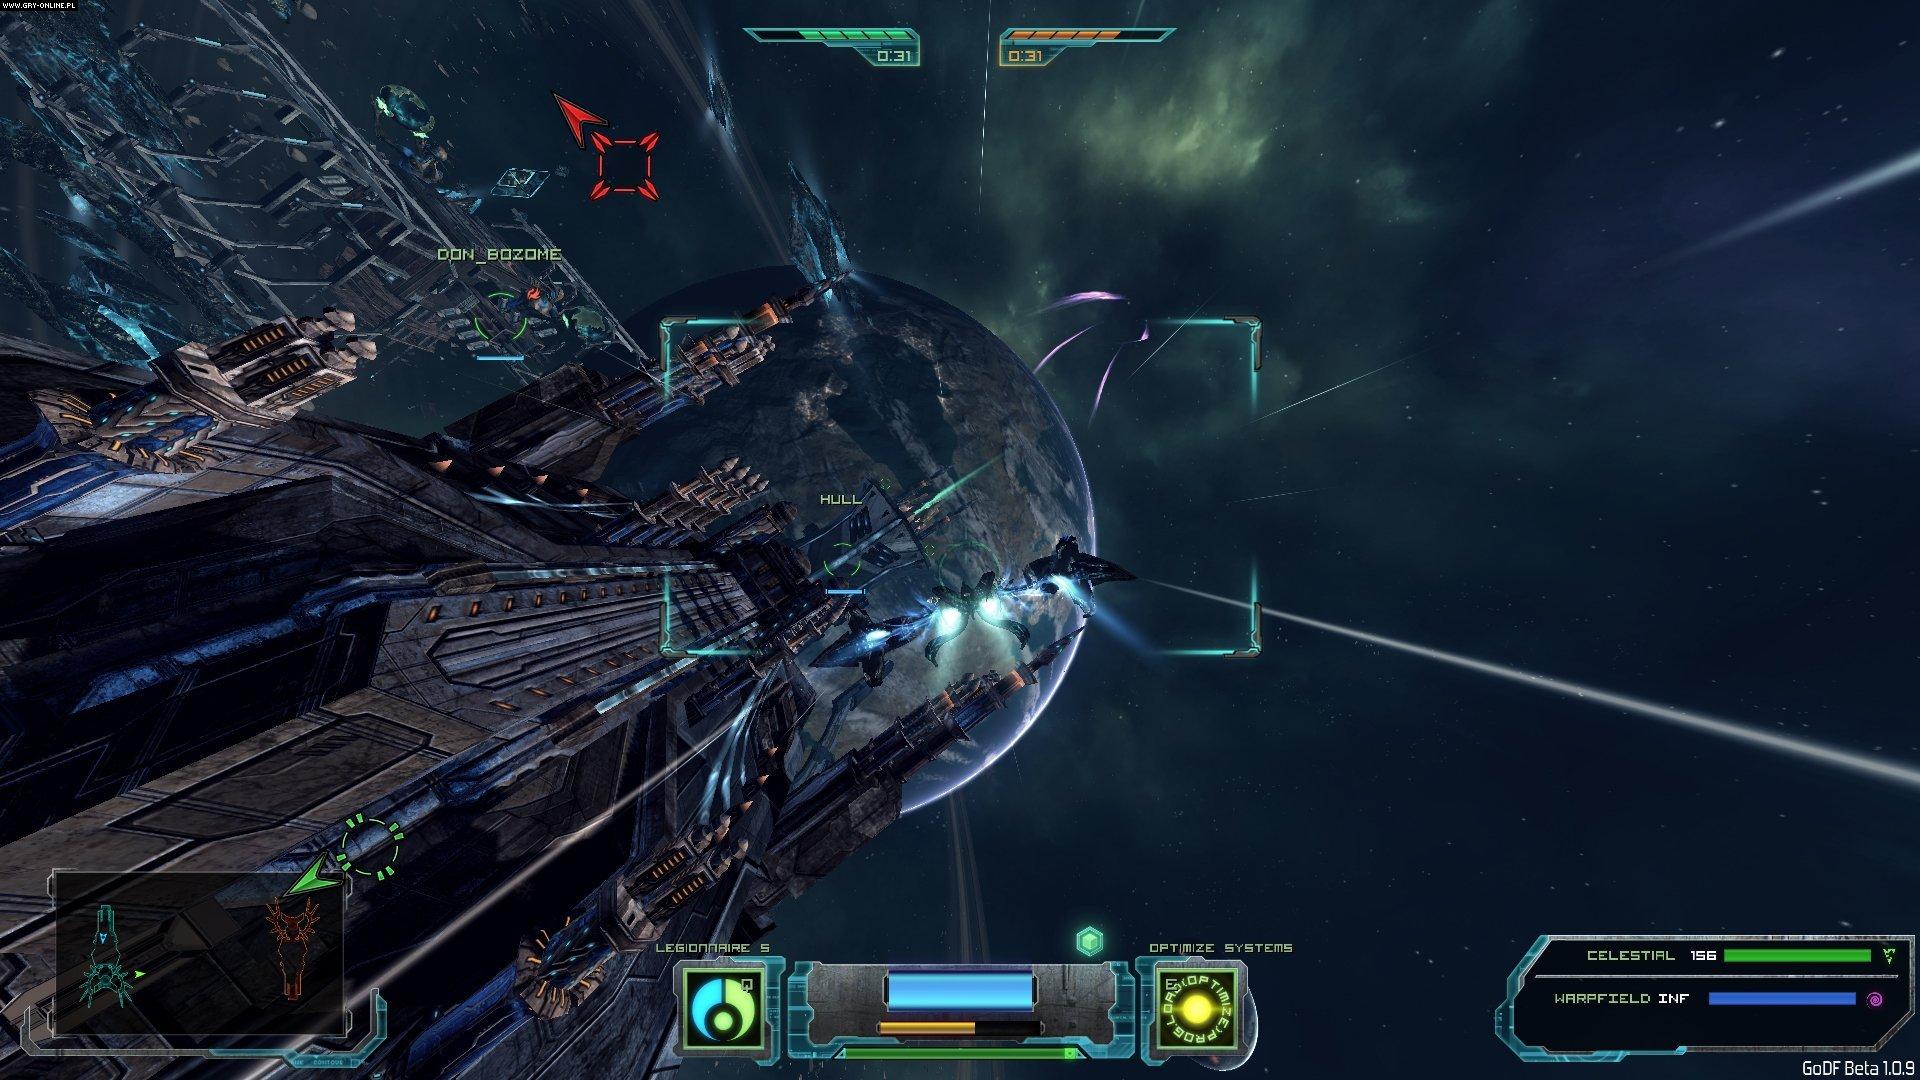 GoD Factory: Wingmen - screenshots gallery - screenshot 4/17